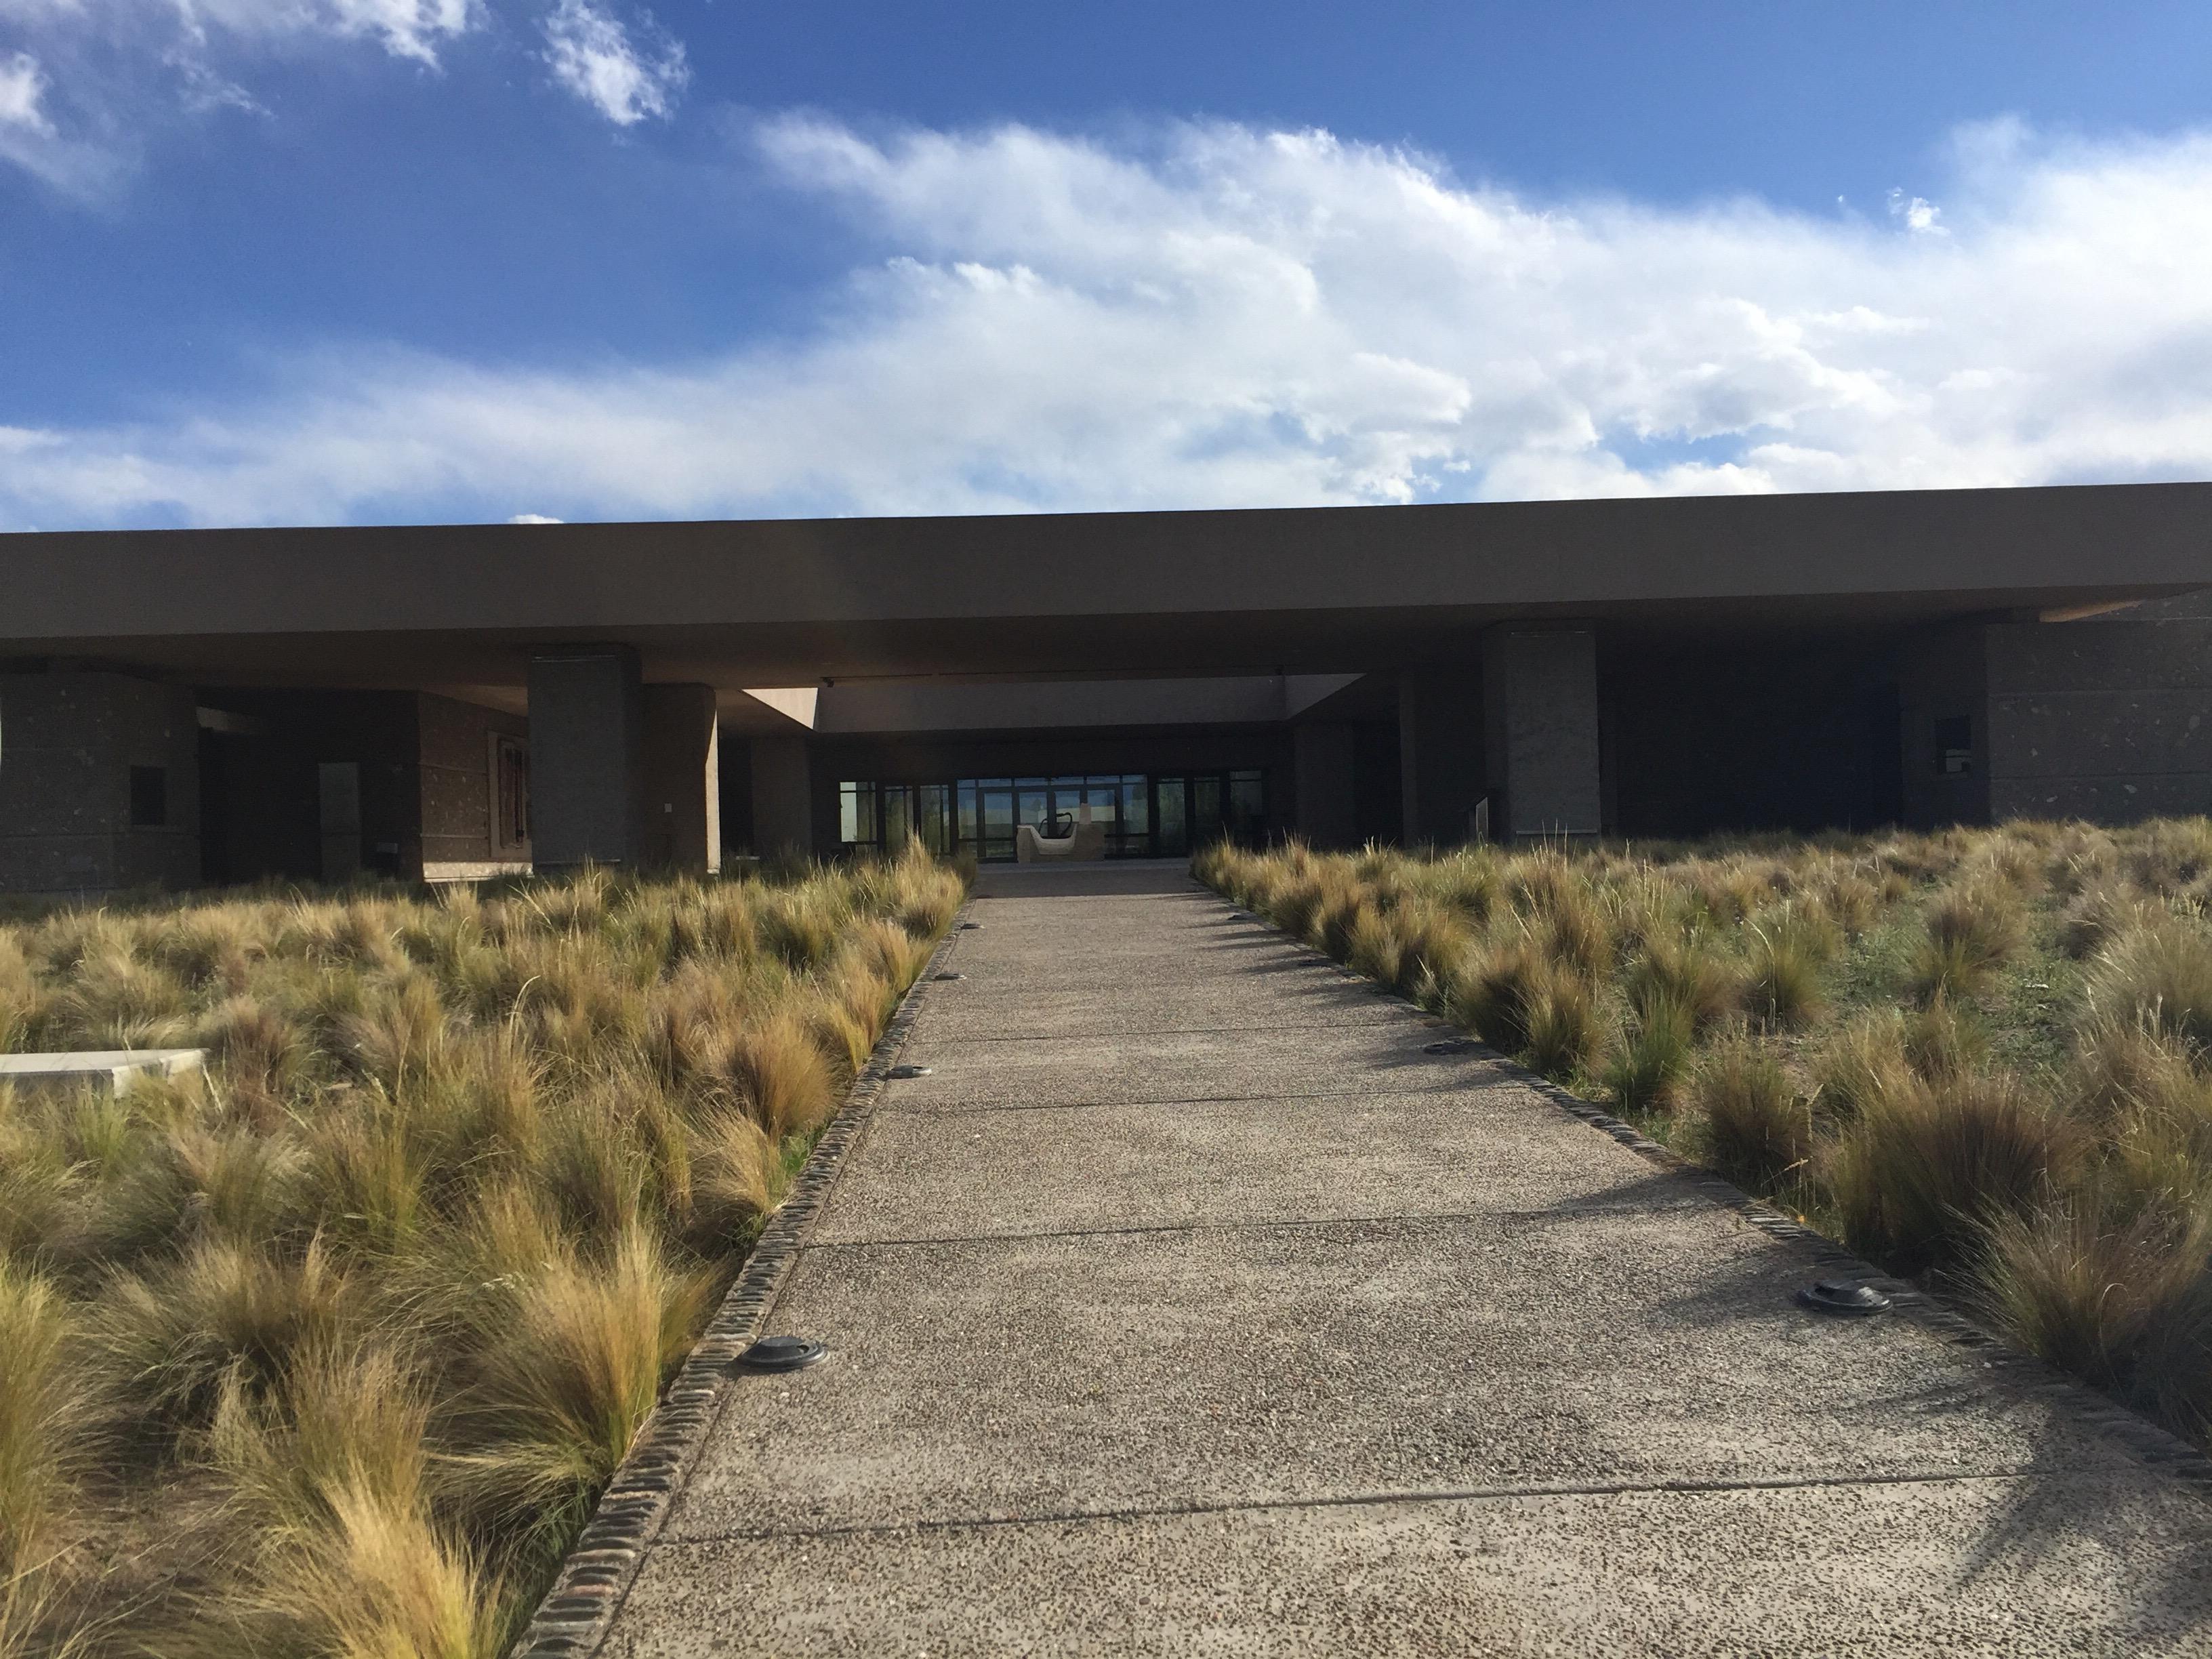 img 8898 - Paseando por la Bodega Salentein en Mendoza